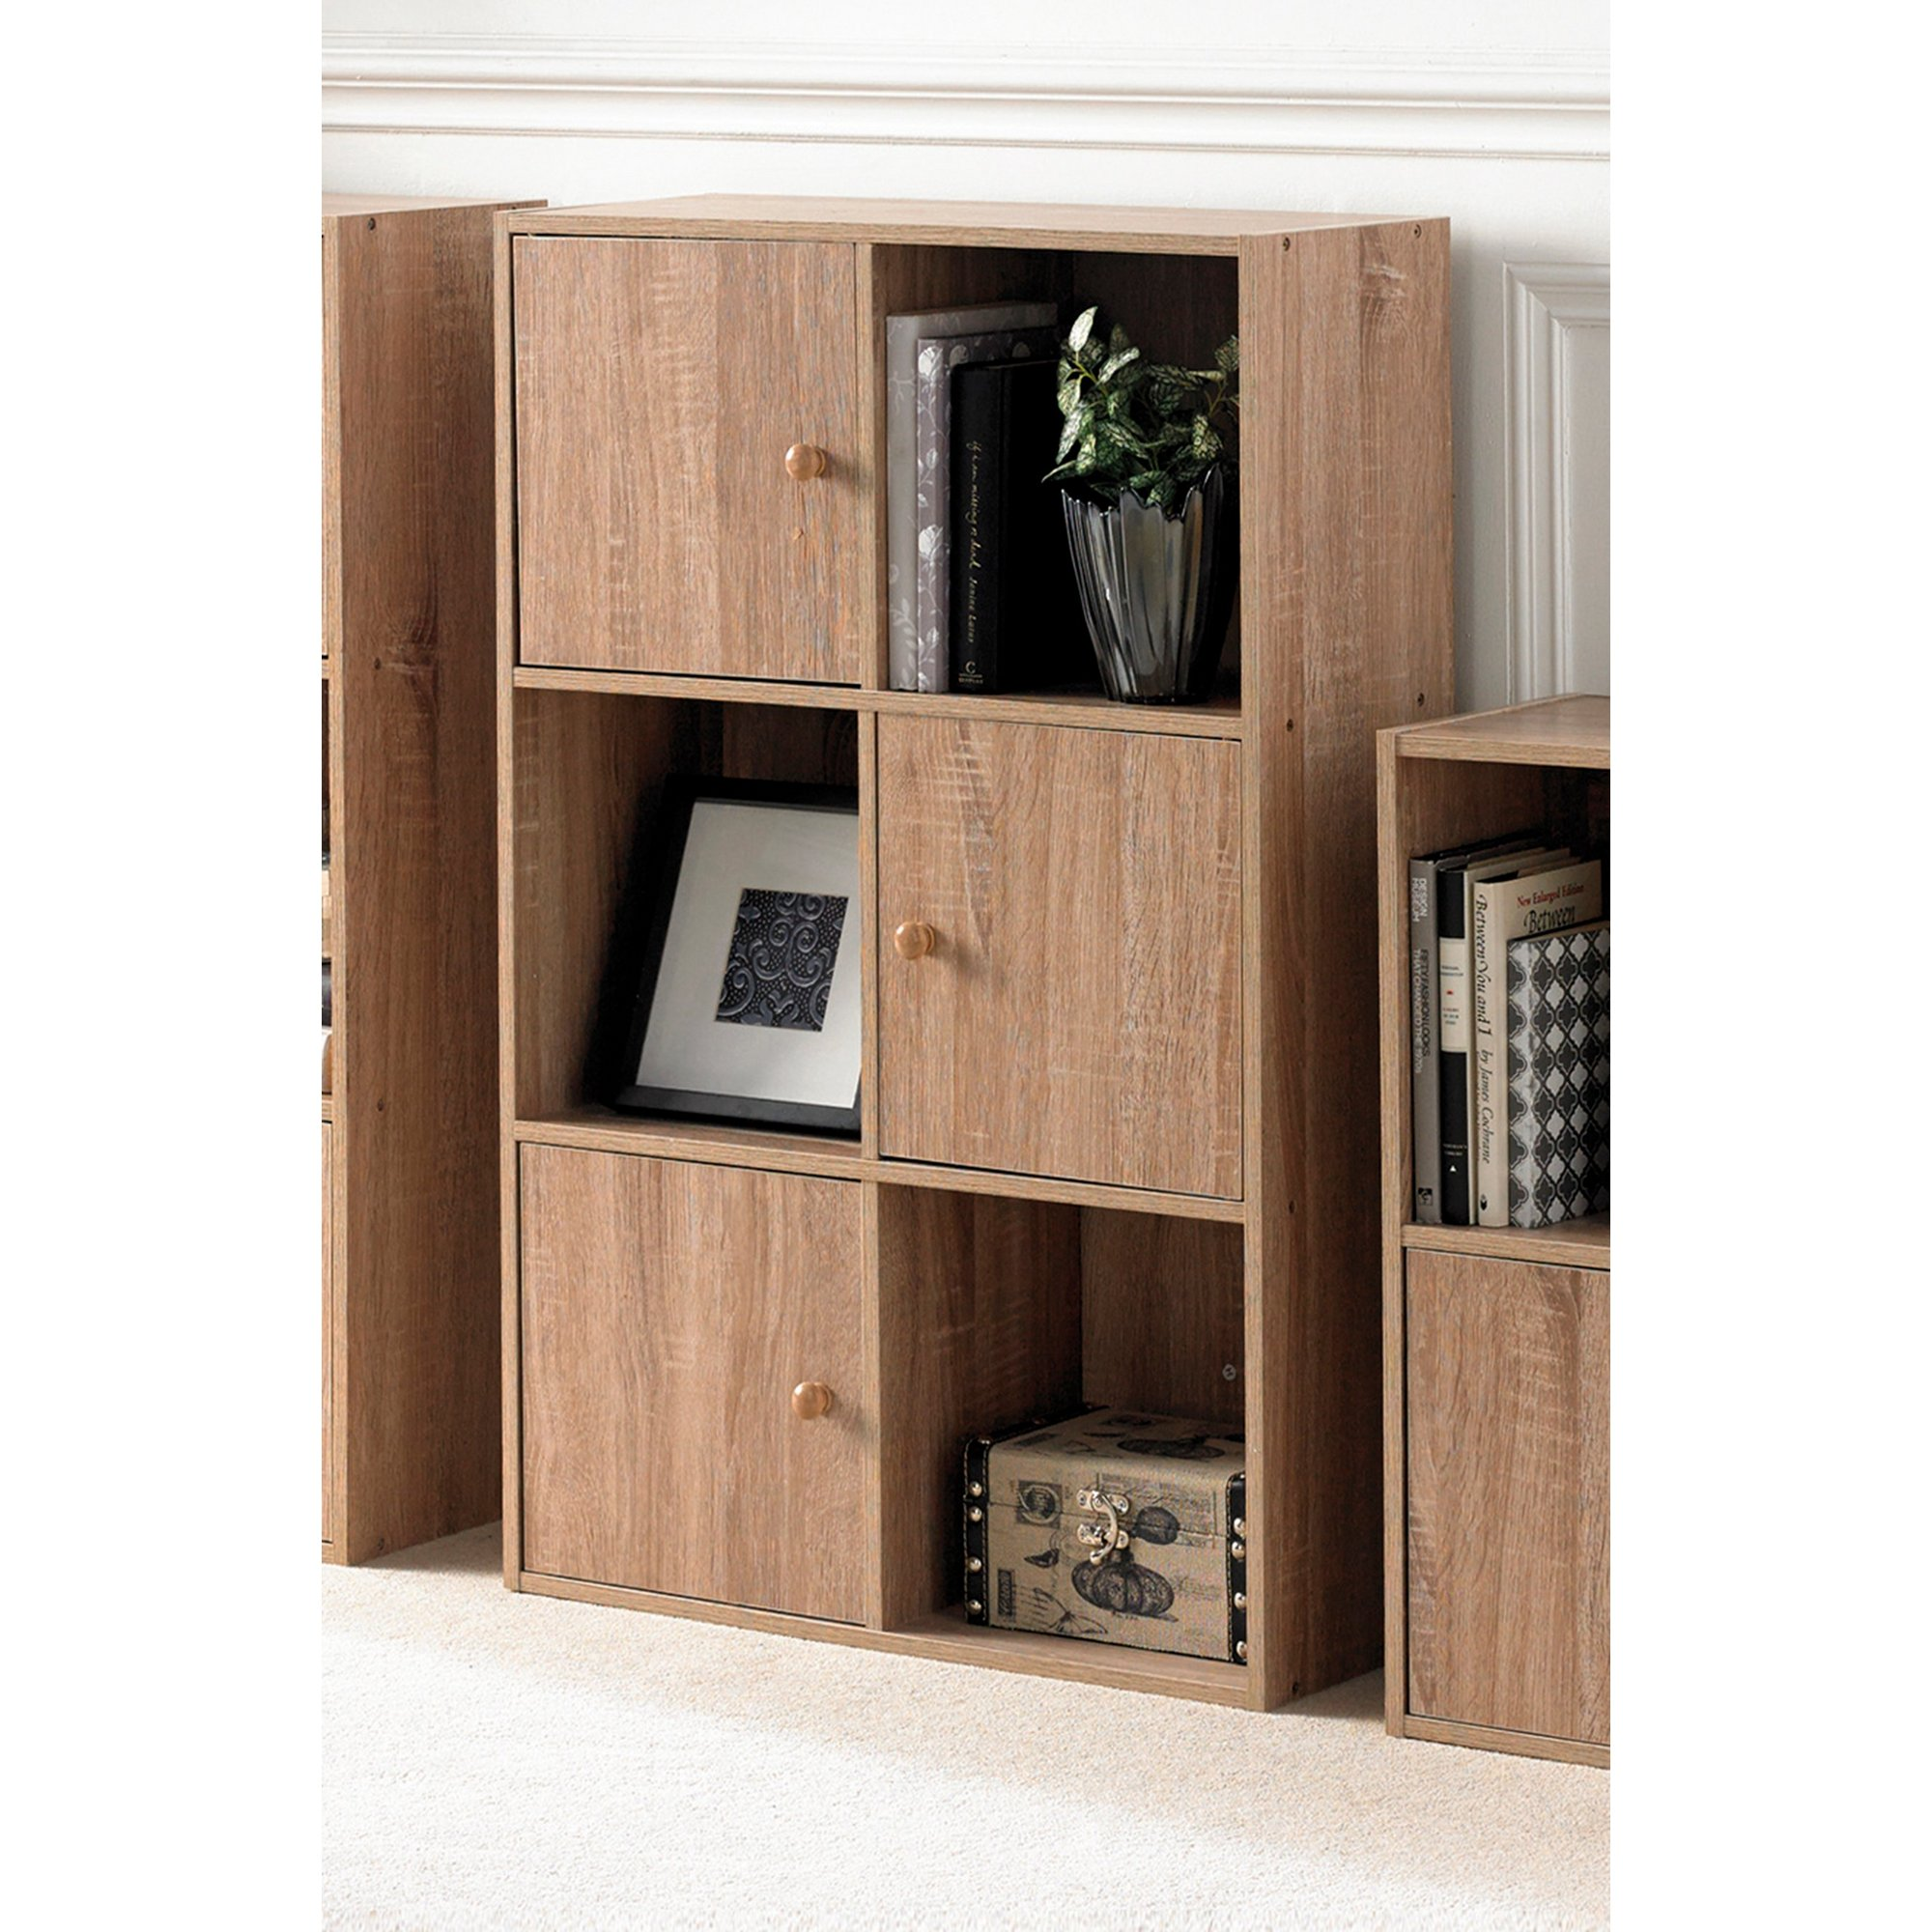 Image of 6 Cube Oak-Effect Storage Unit with Wood Doors